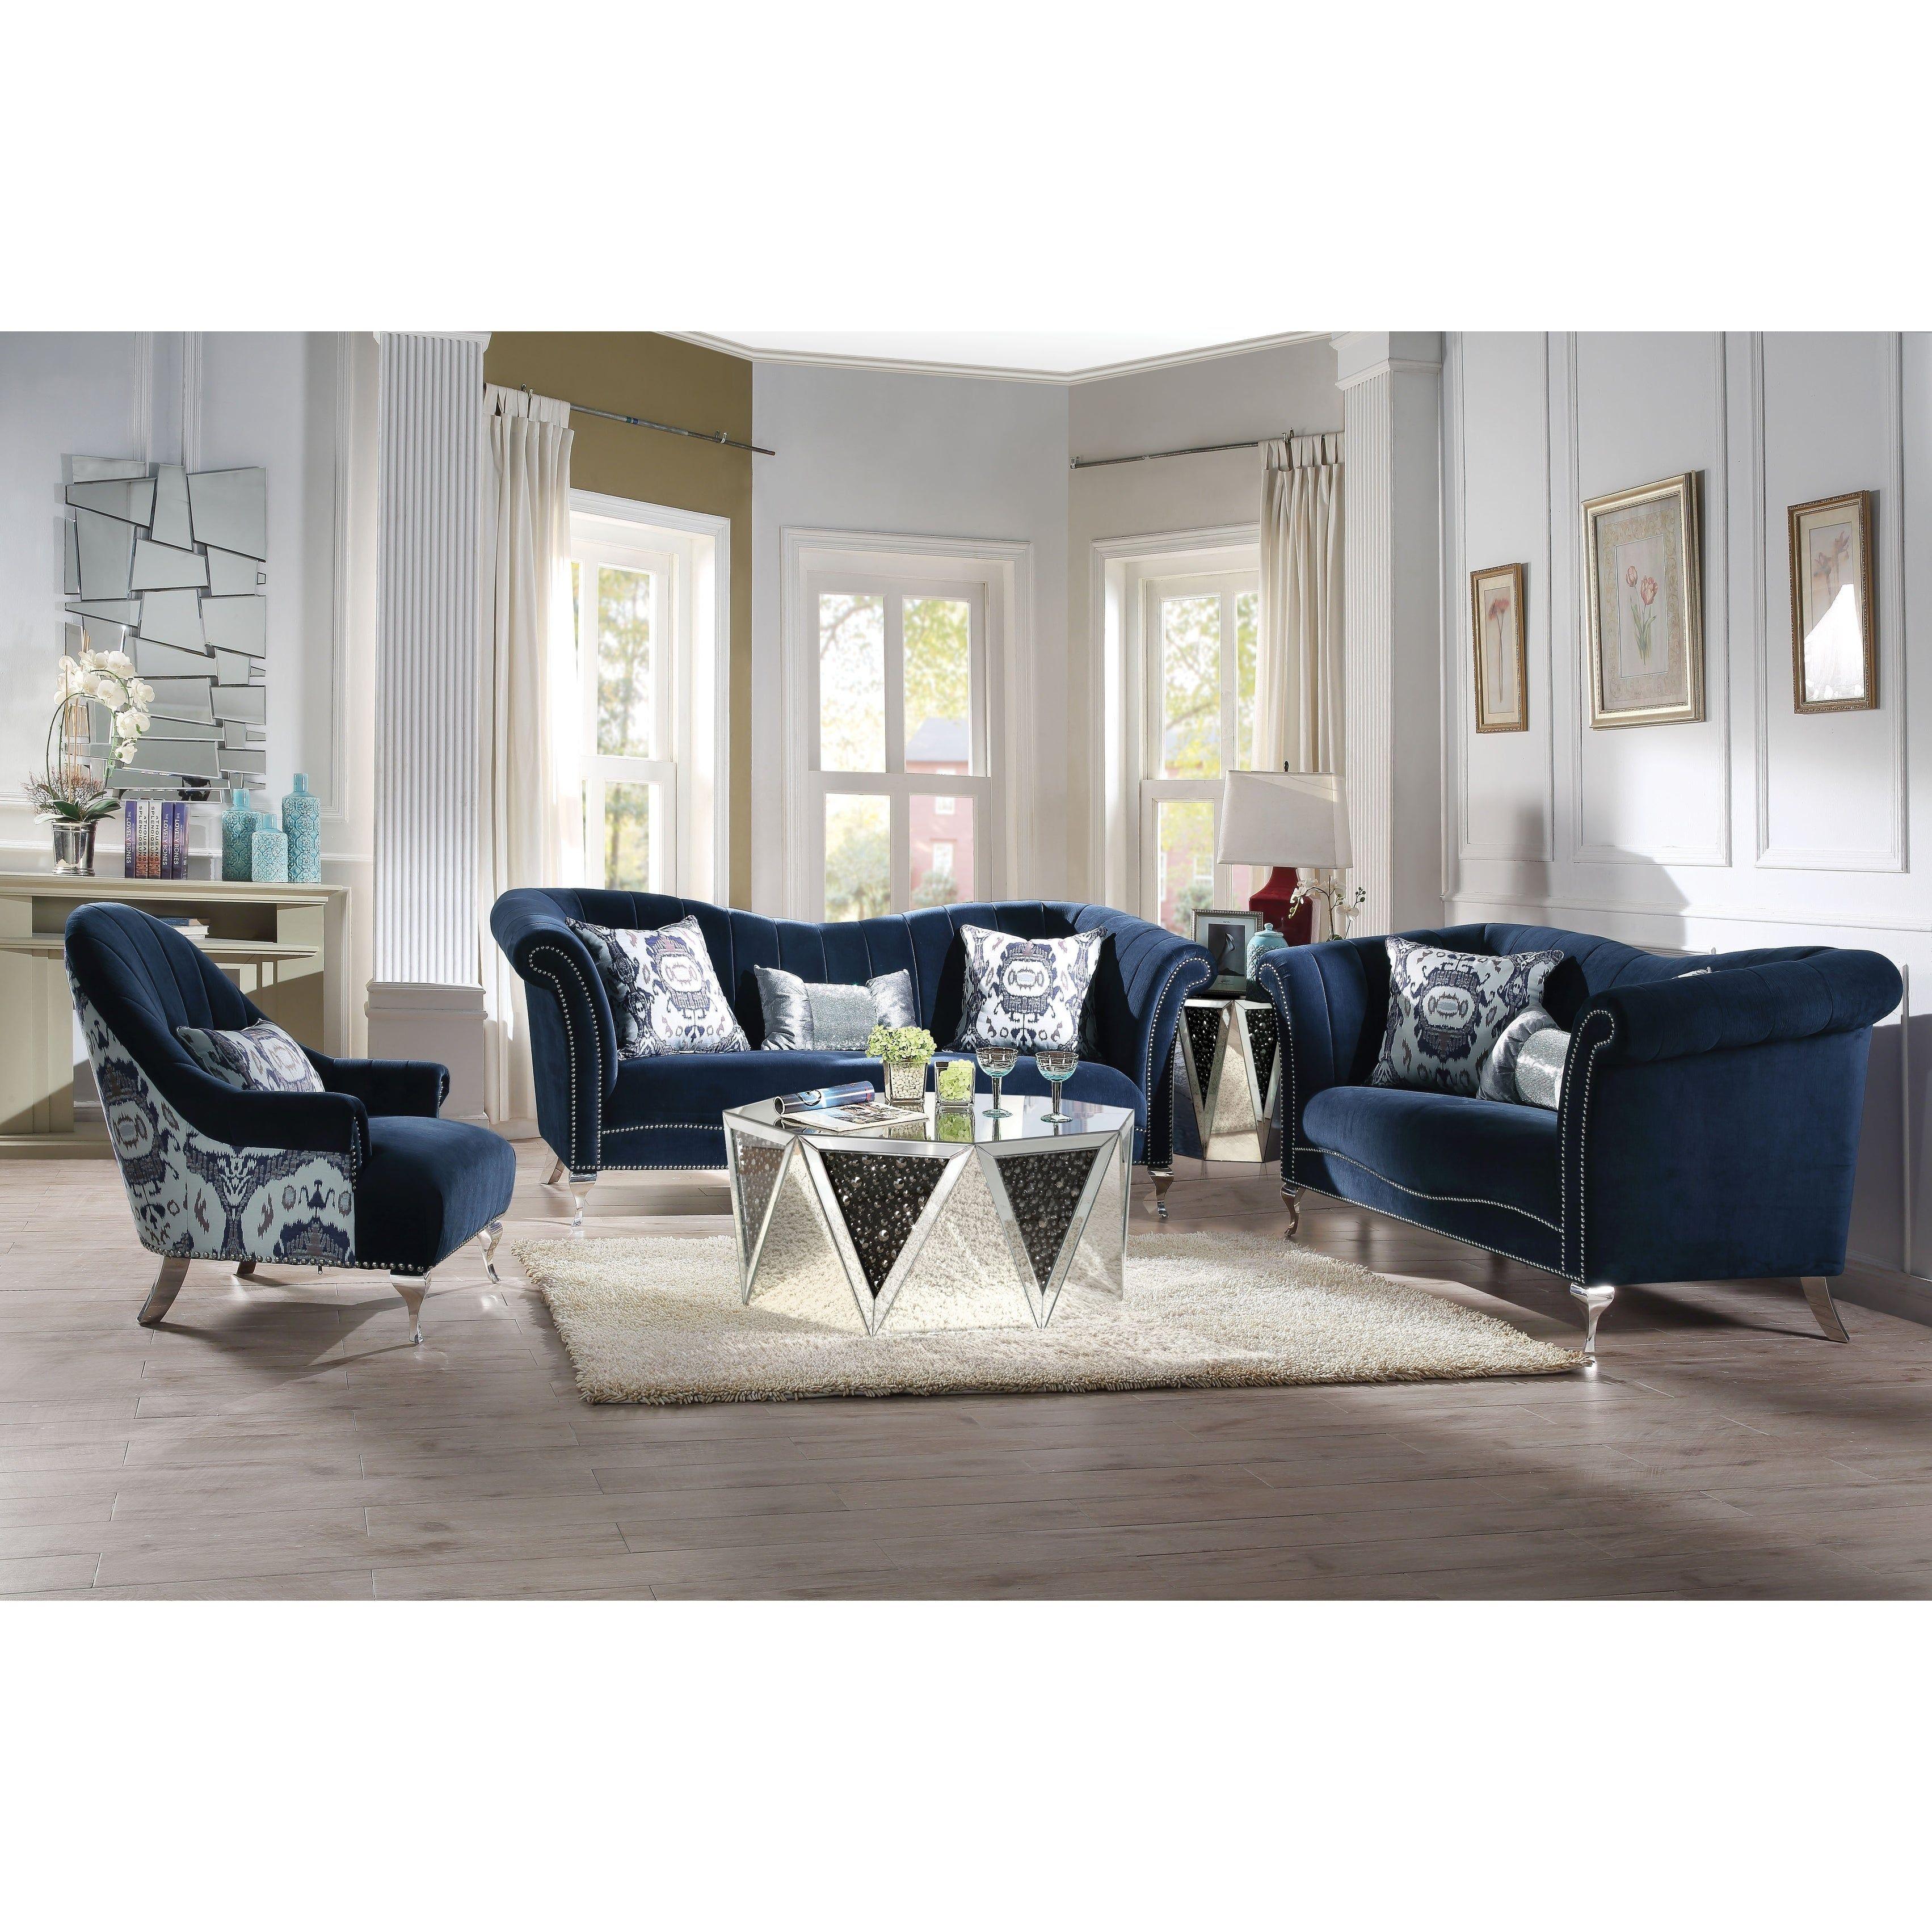 Our Best Living Room Furniture Deals Living Room Sets Living Room Sets Furniture Blue Velvet Sofa Velvet living room set